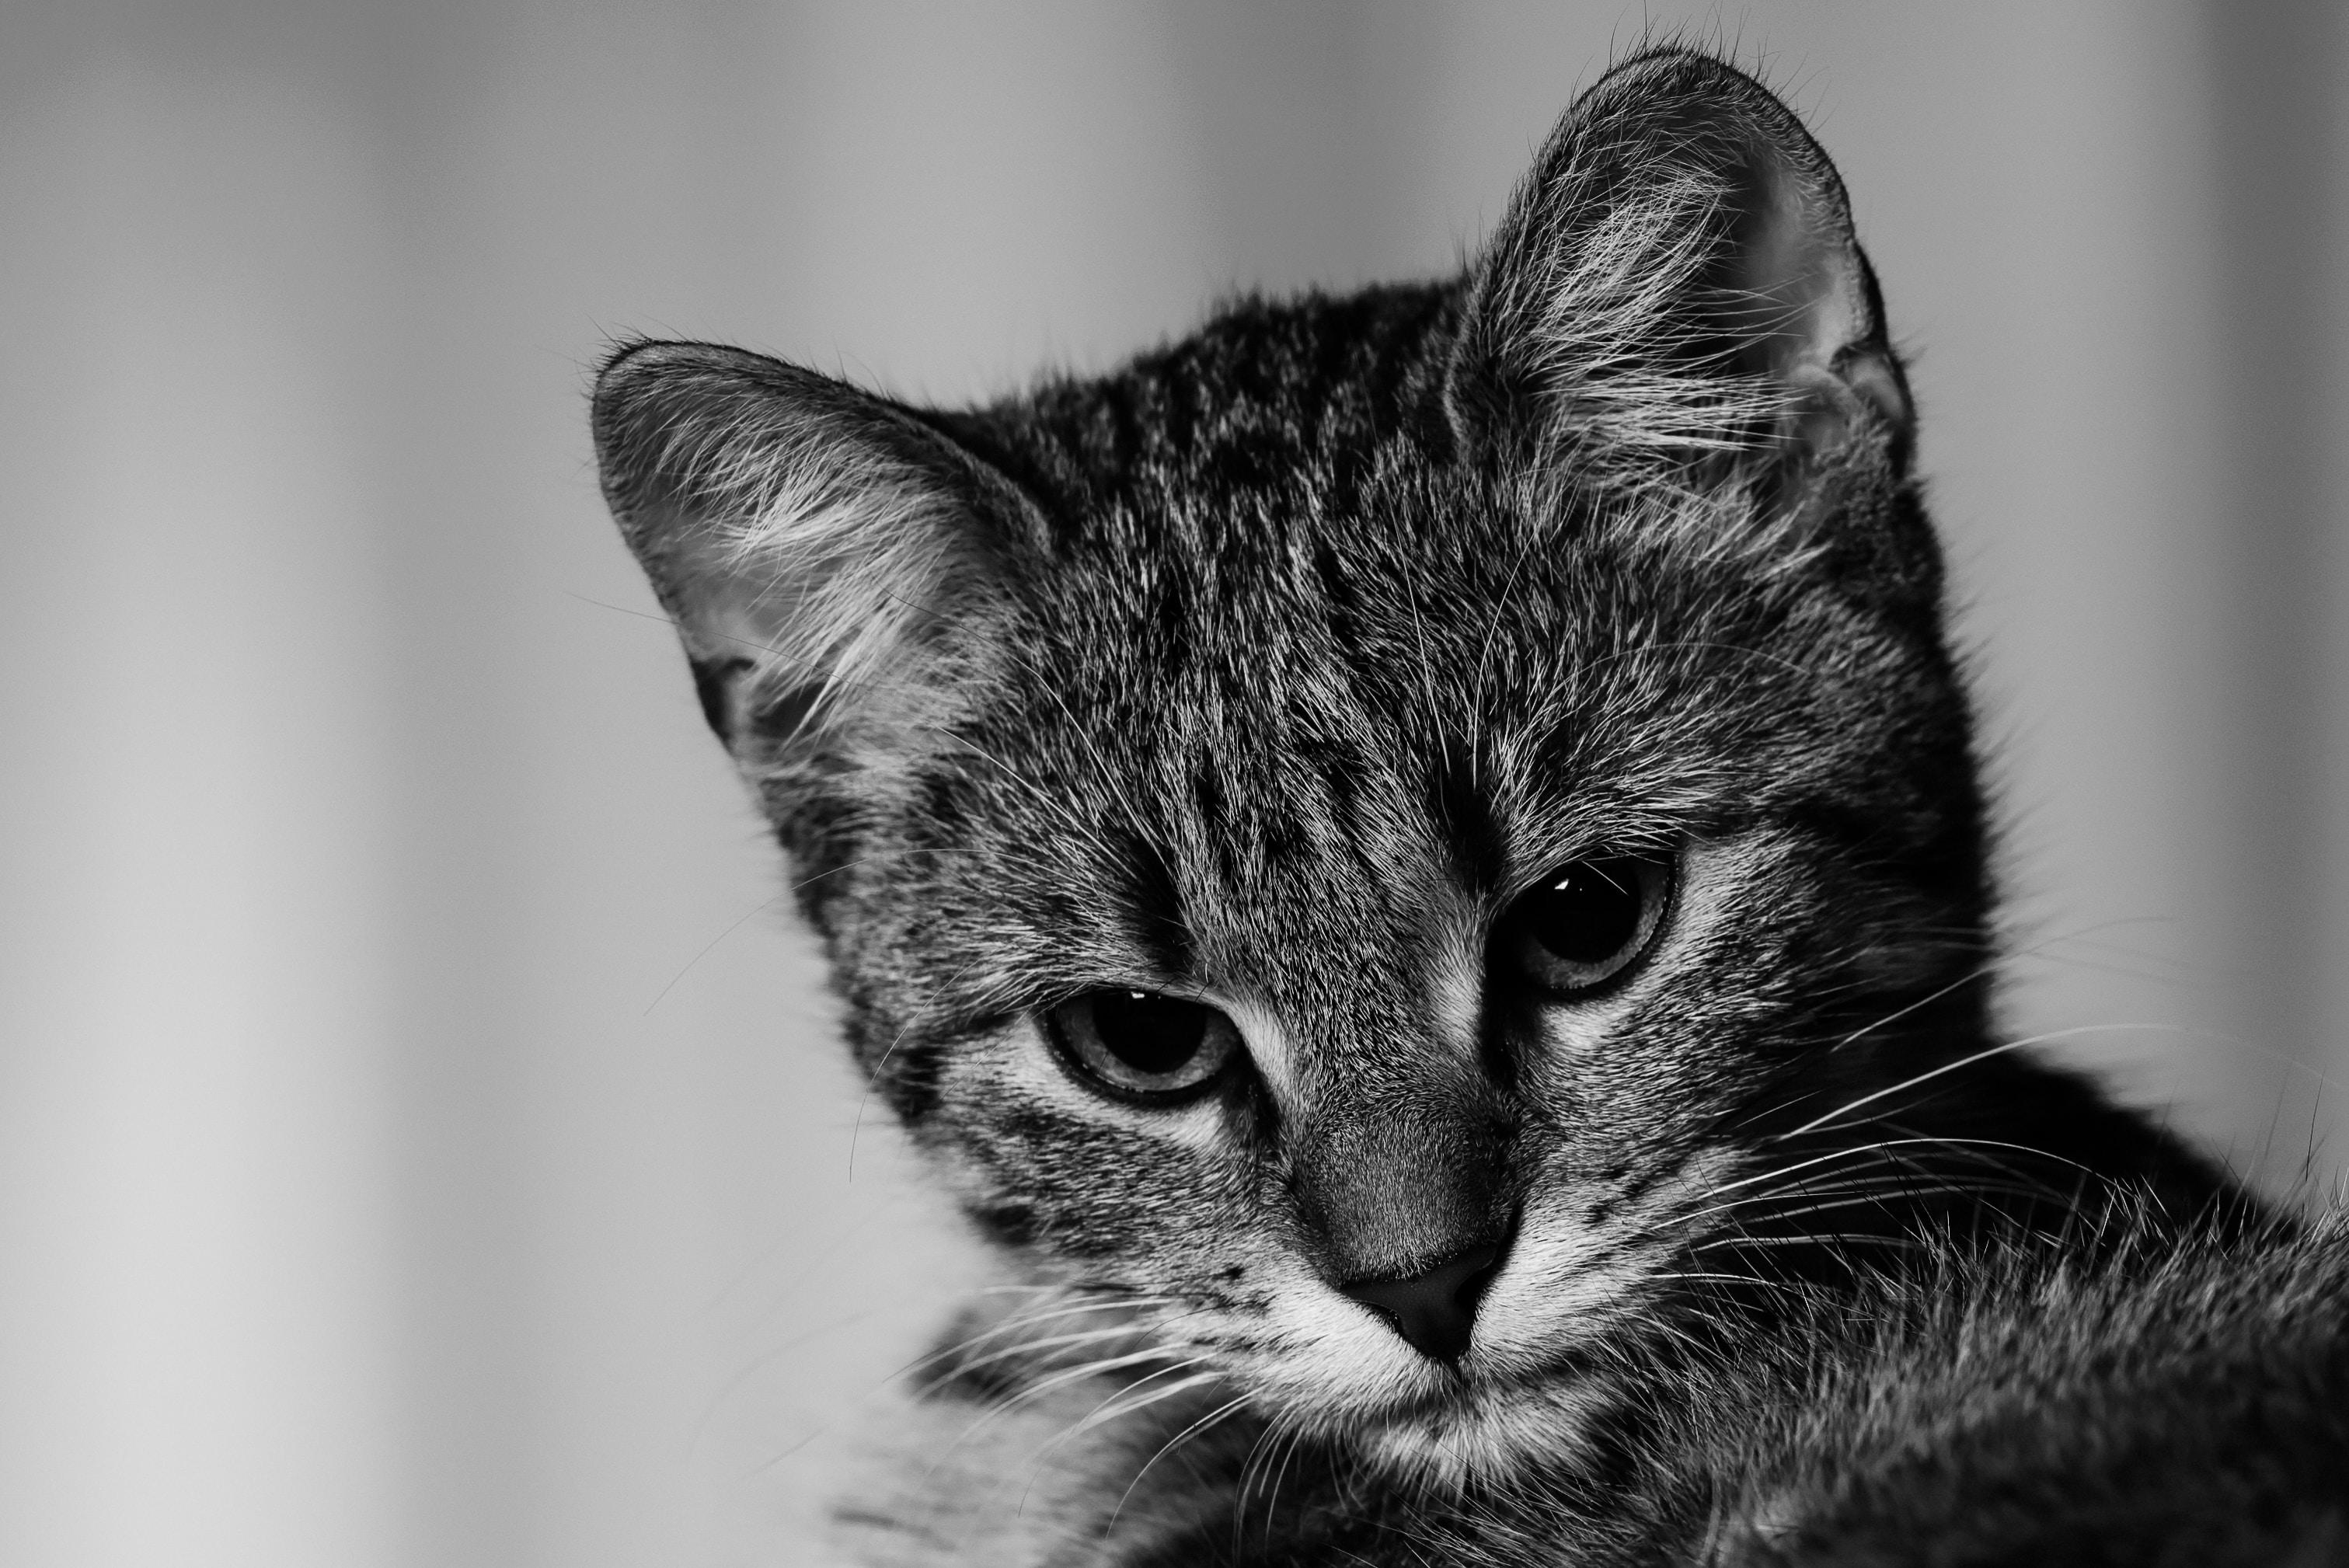 Black and white shot of domestic kitten head